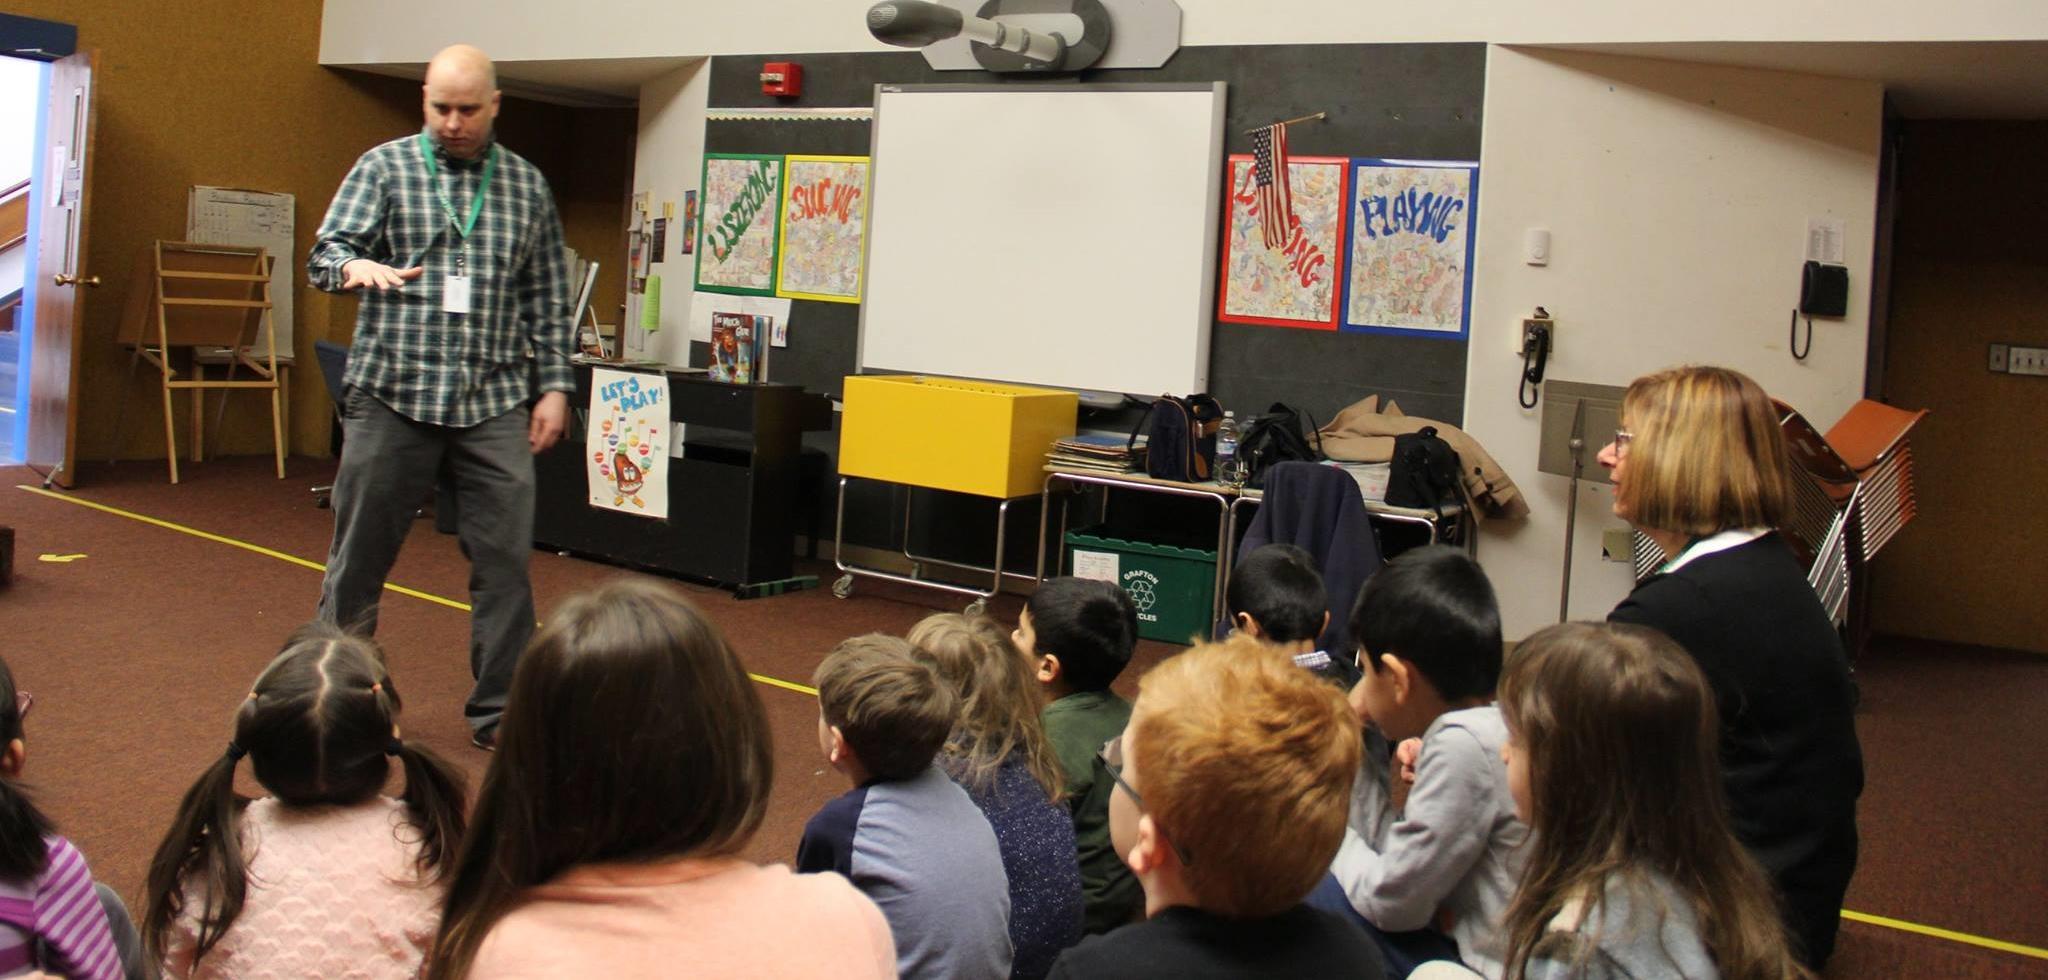 School visit! South Grafton Elementary, South Grafton, MA